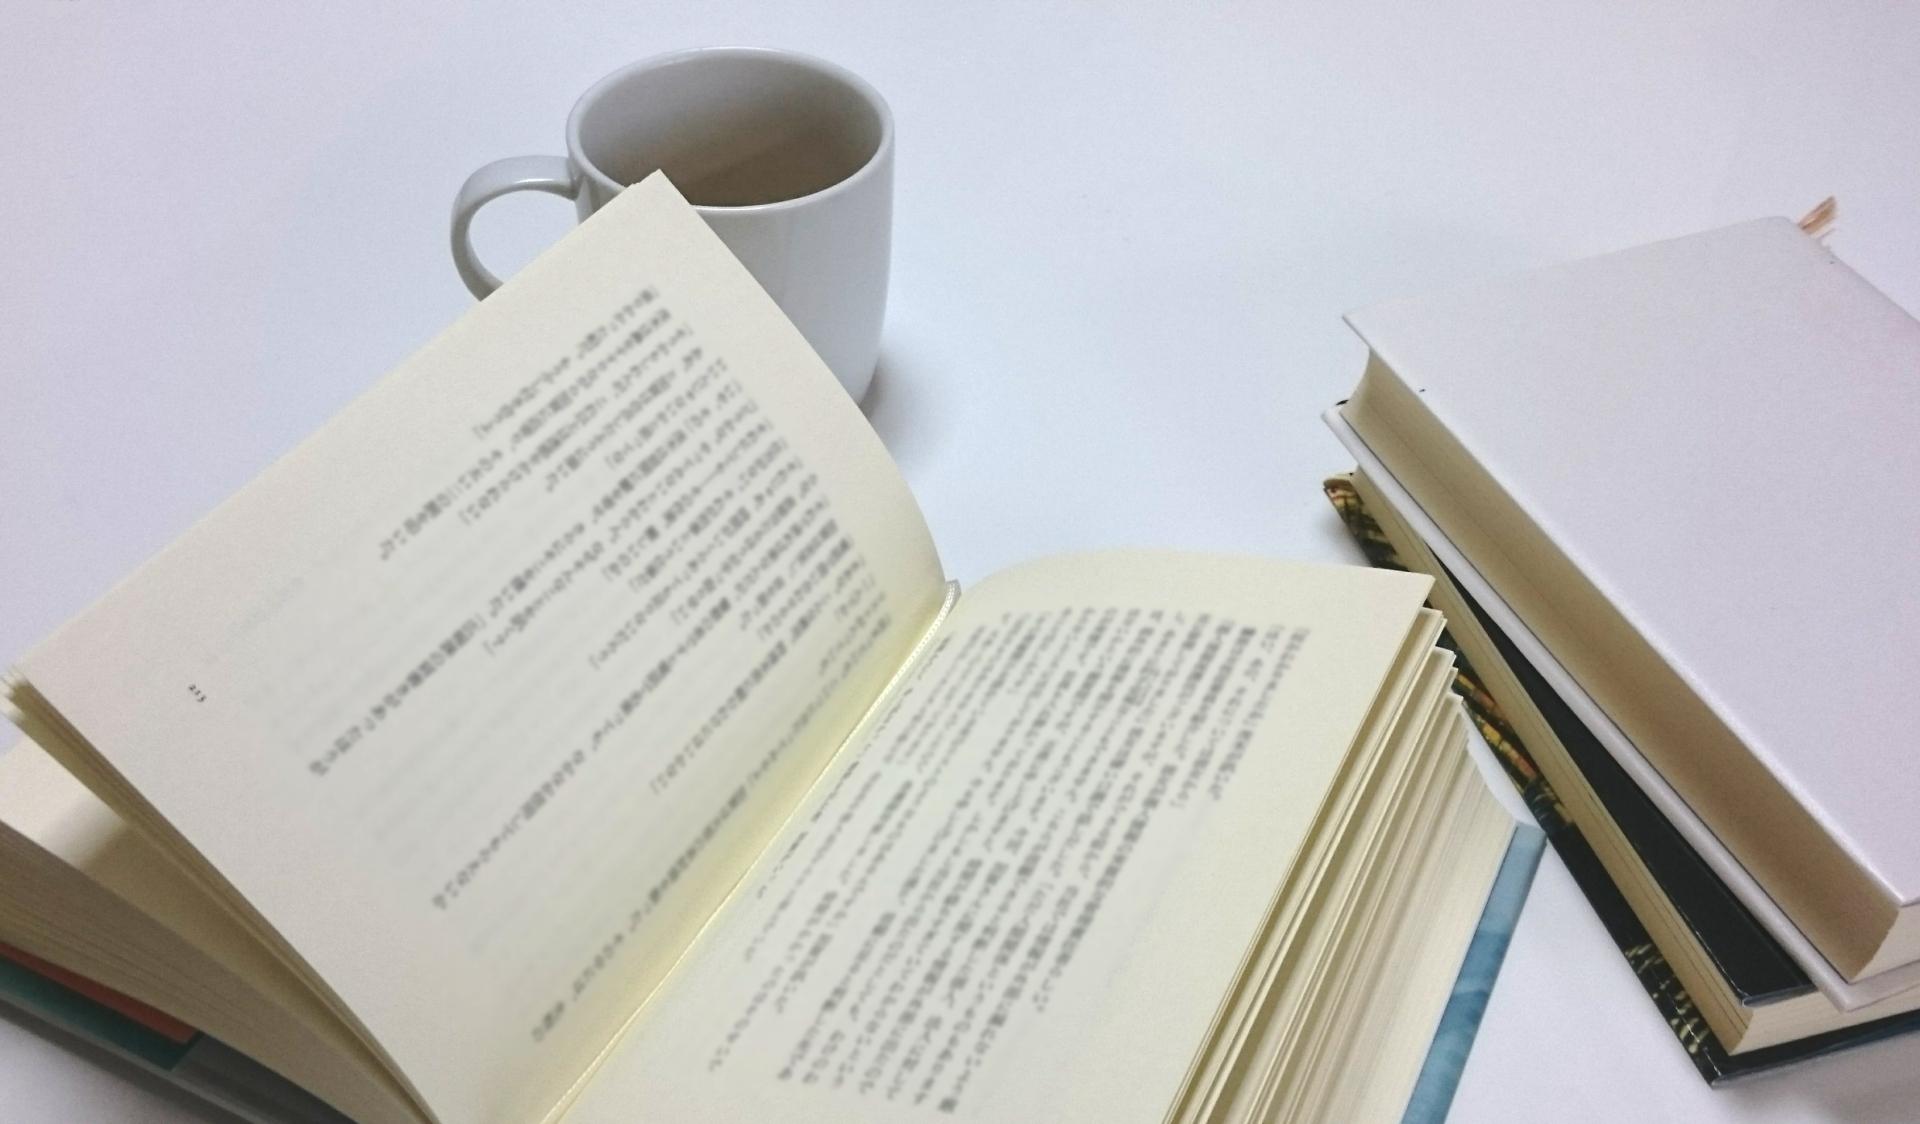 NIKE創業者の自伝本が1位に!編集部おすすめの1冊【2017年11月ビジネス書ランキング】